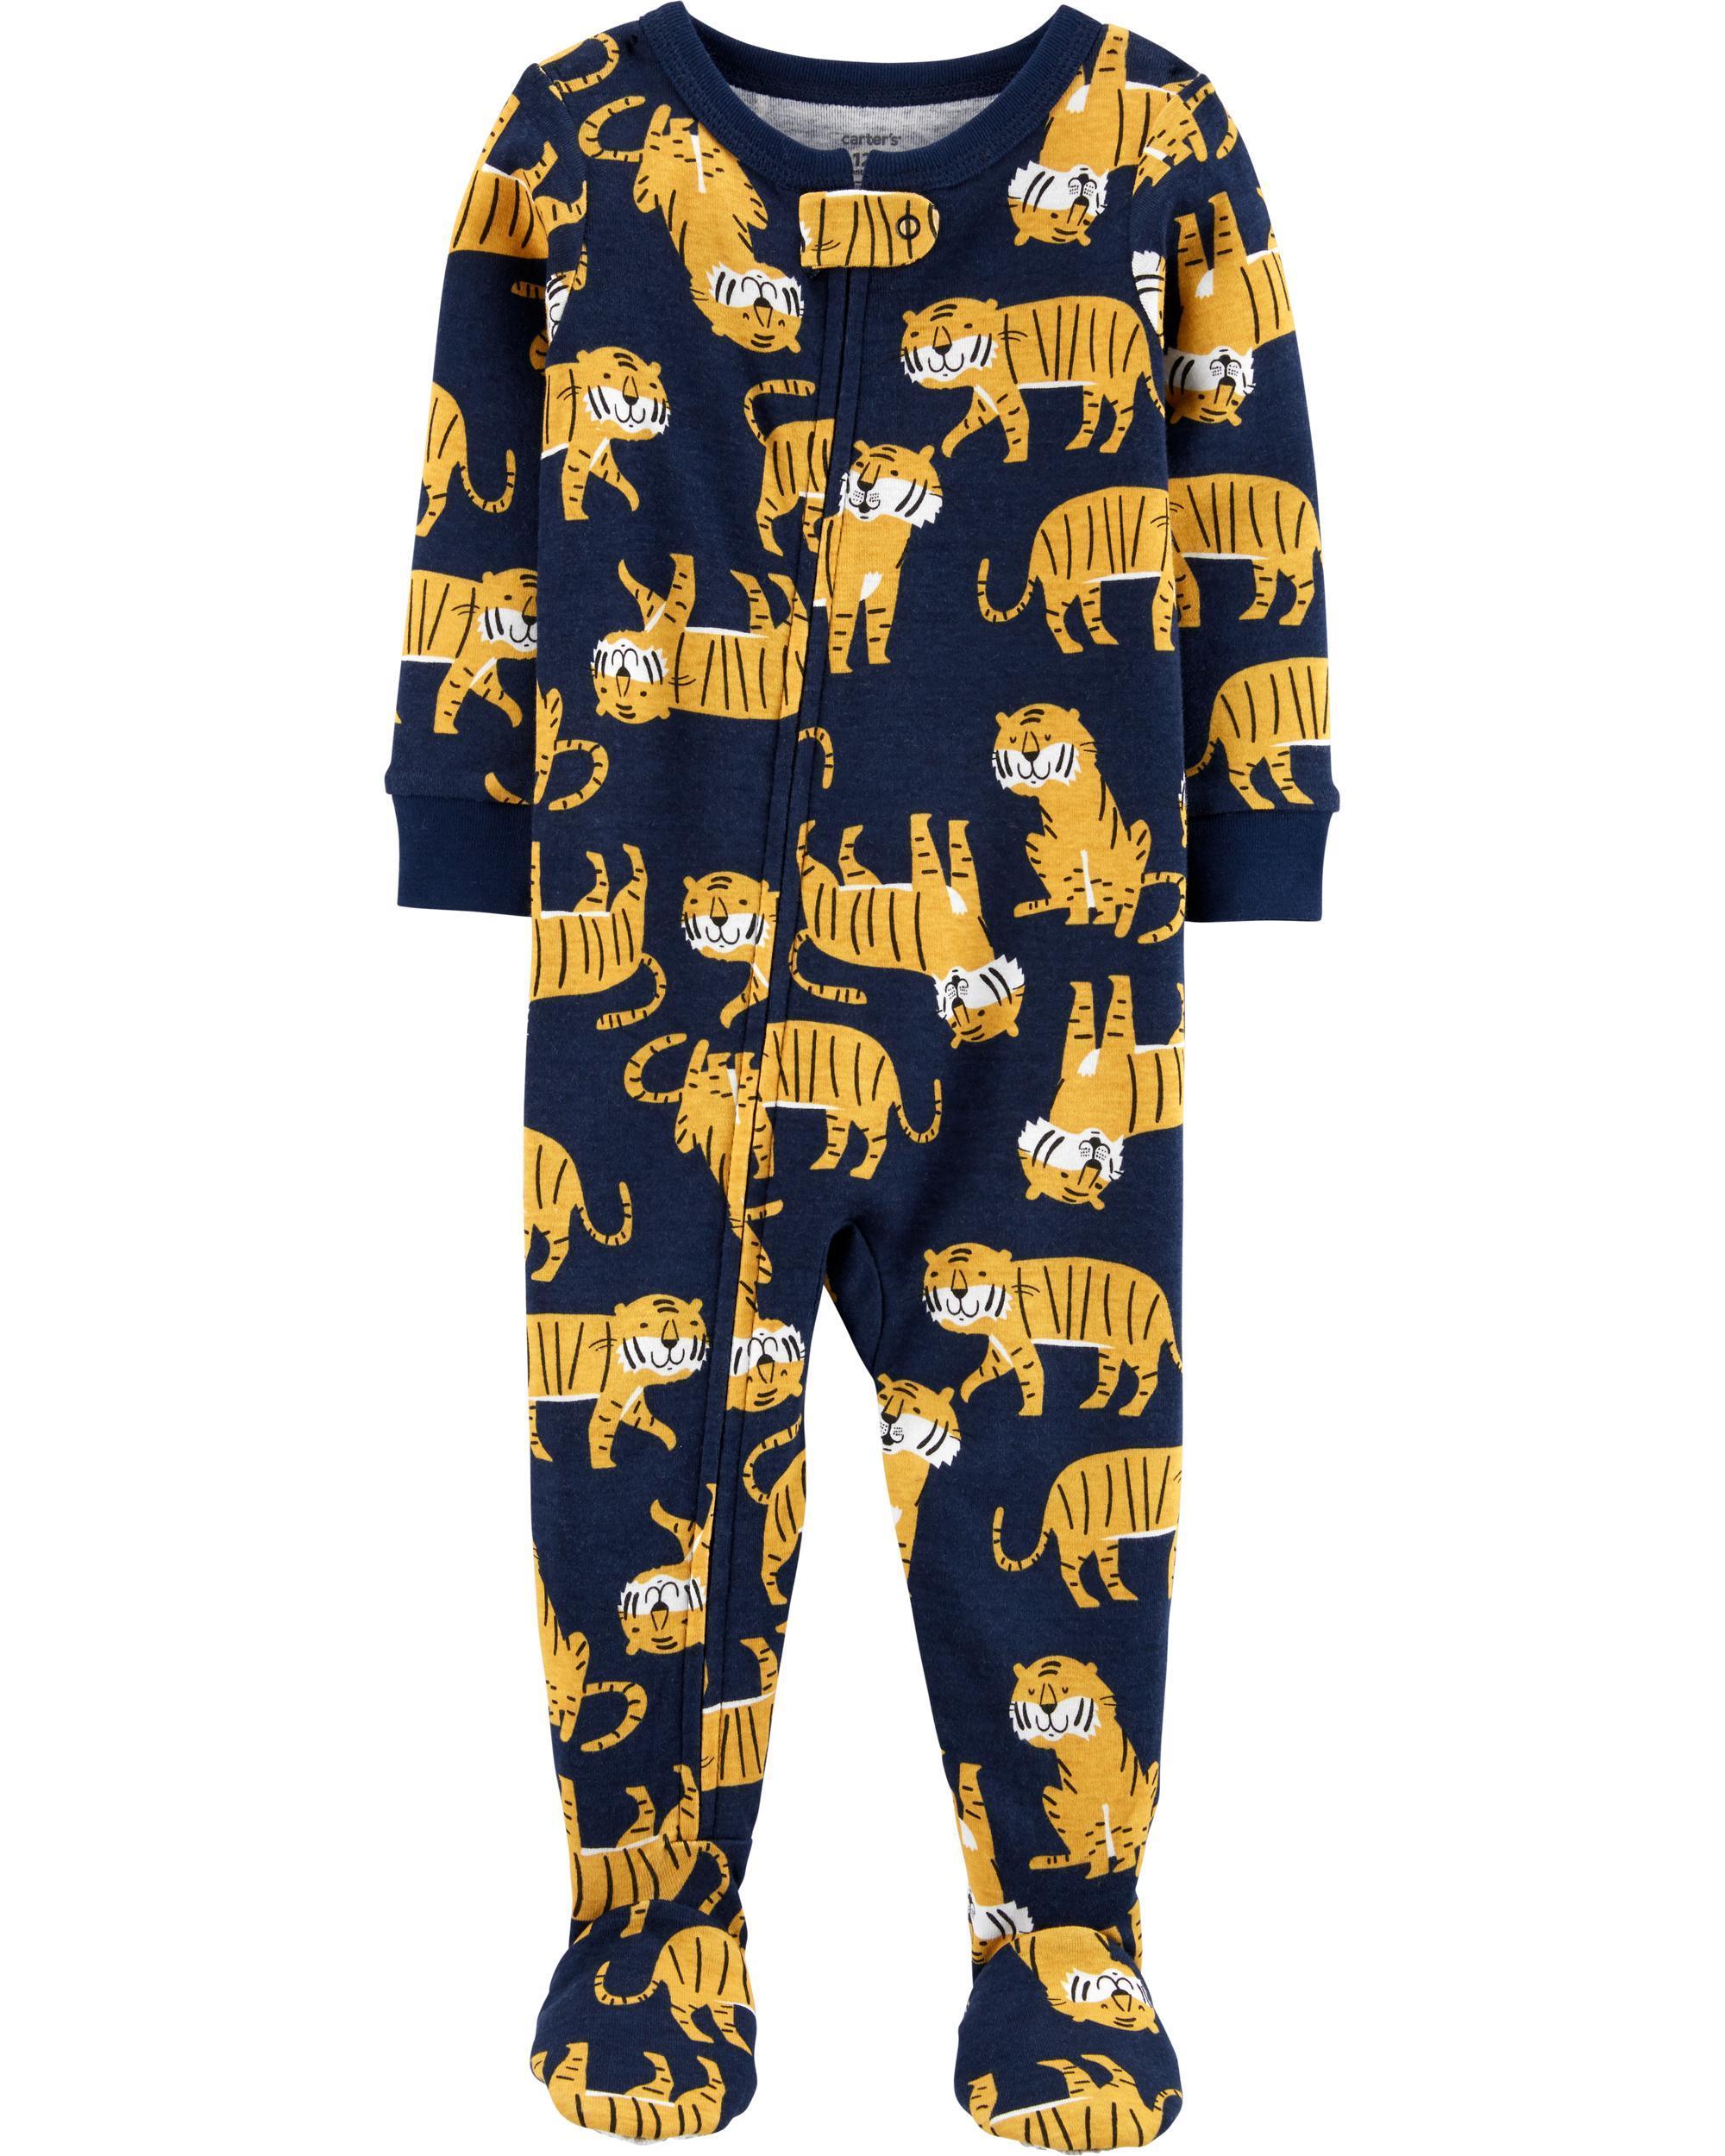 NWT Carters Fire Truck Construction Toddler Boys Footed Fleece Sleeper Pajamas